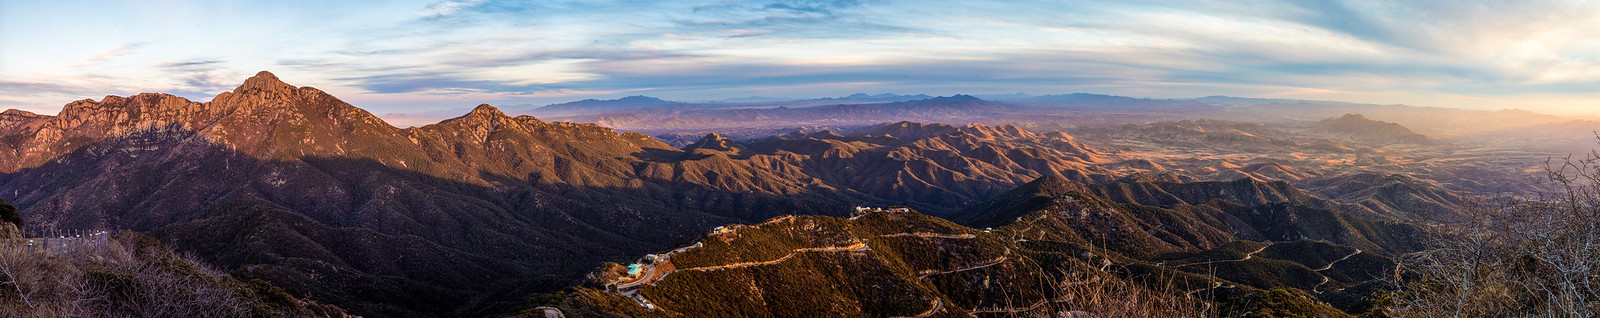 Mt. Wrightson, Sunset